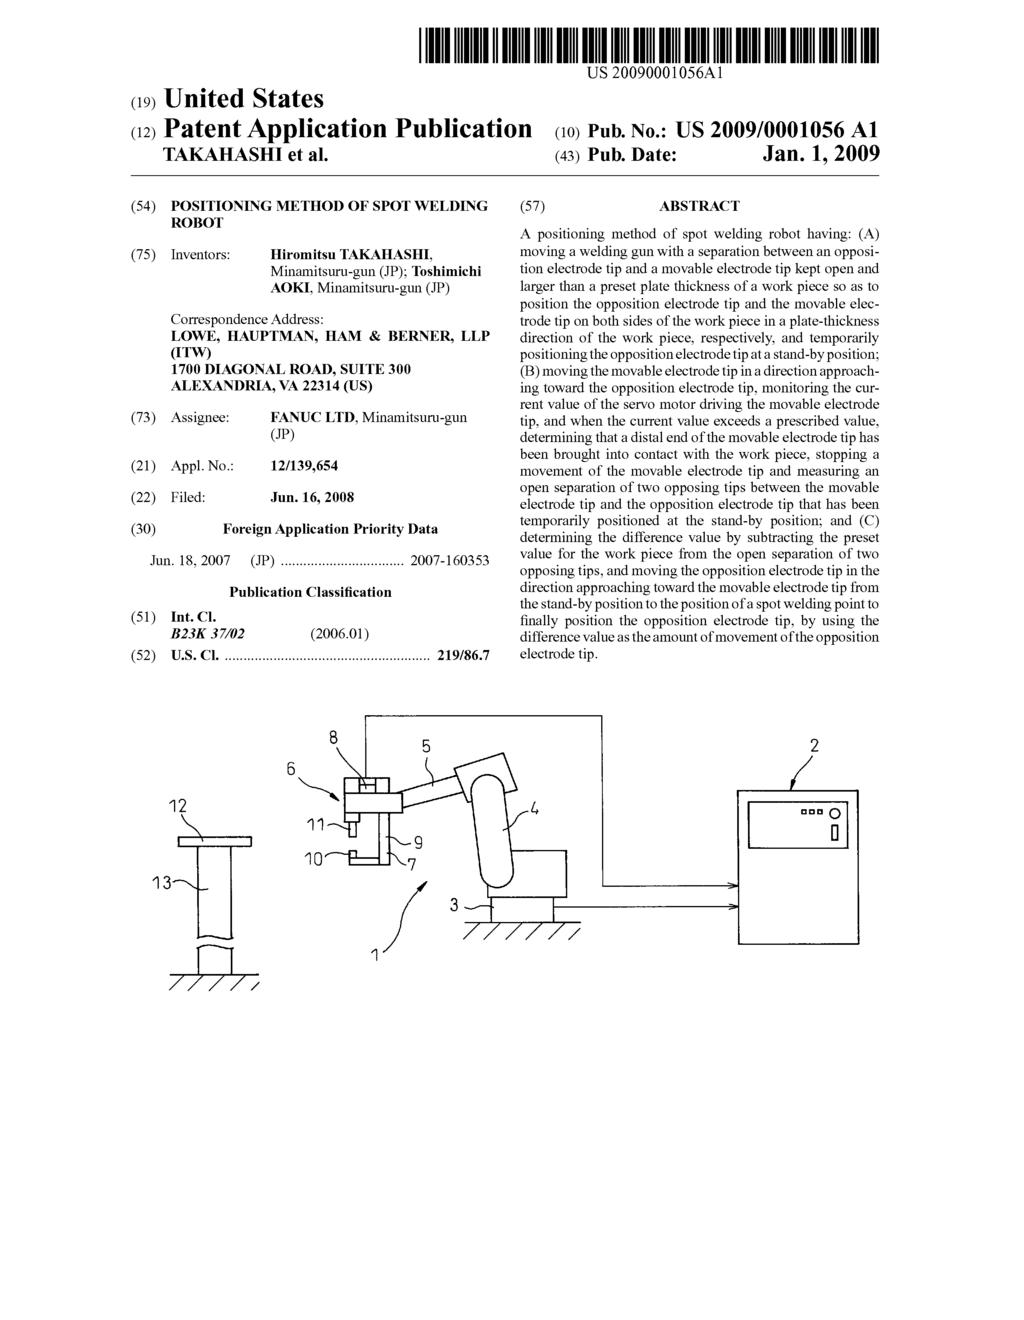 POSITIONING METHOD OF SPOT WELDING ROBOT - diagram, schematic, and image 01